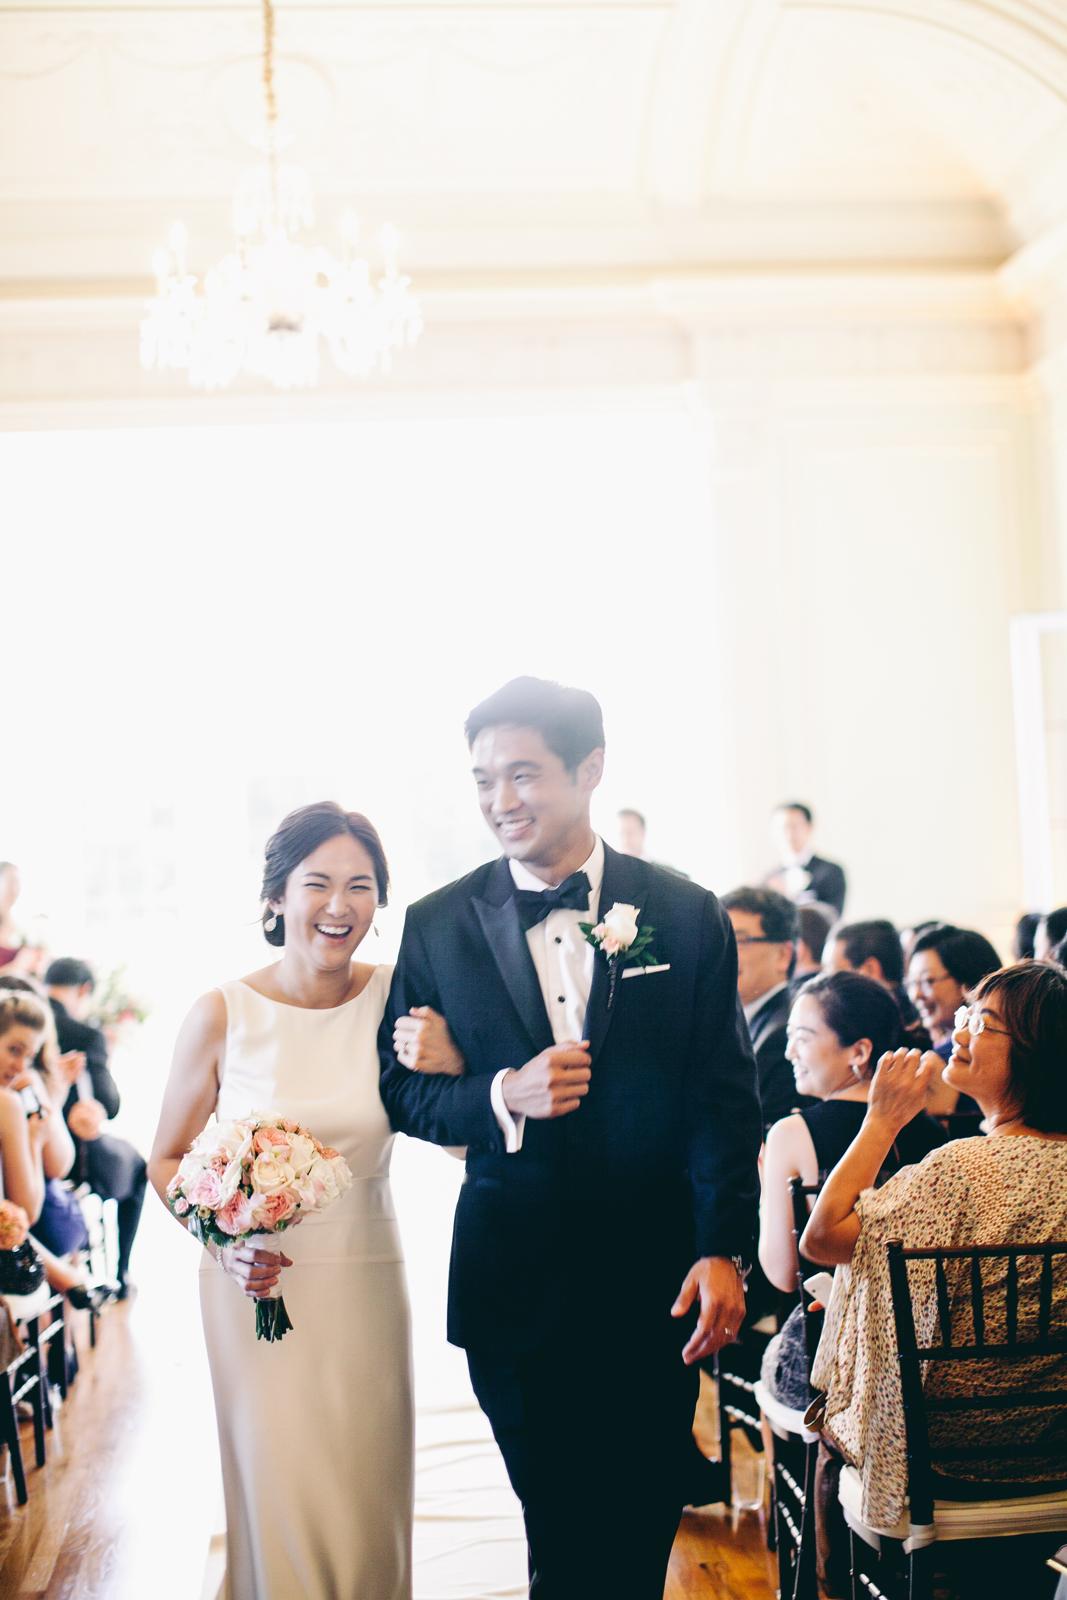 kohl_manison_wedding_photography_sarah_eric_ebony_siovhan_bokeh_photography_048.jpg